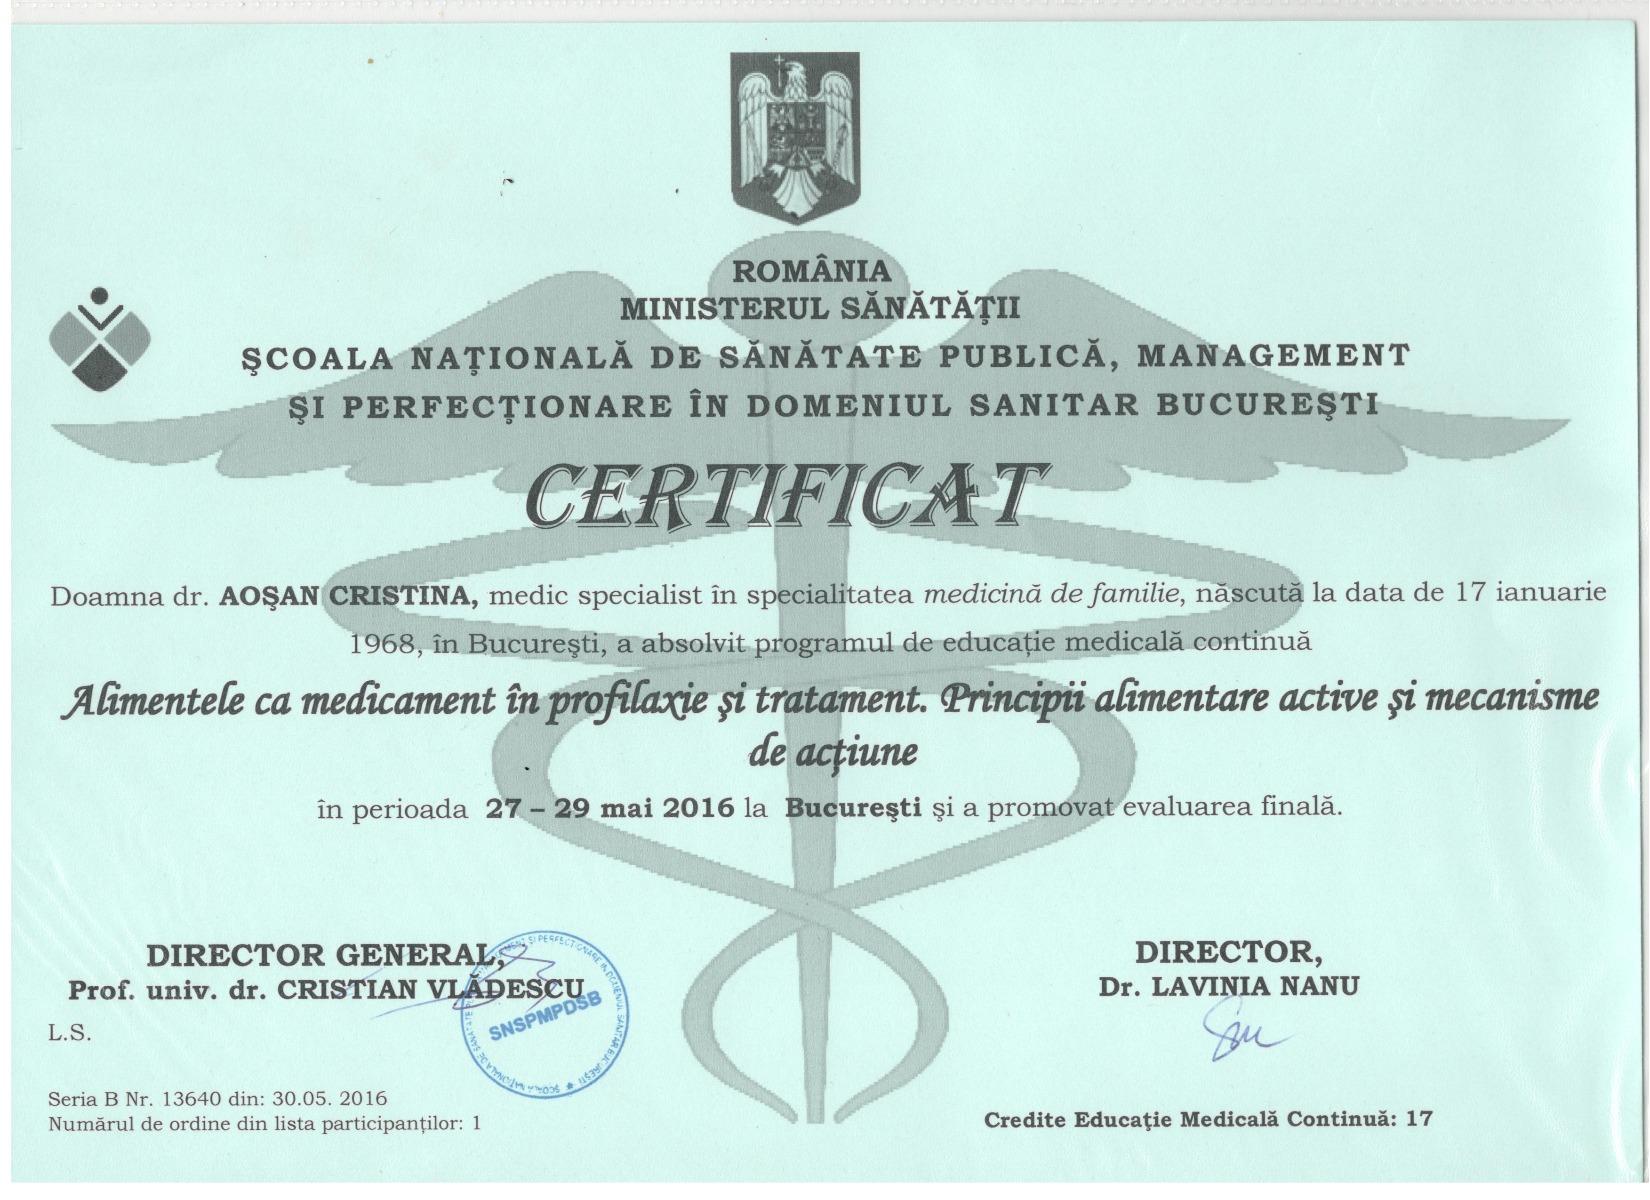 Certificat Scoala Nationala de Sanatate Publica, Ministerul Sanatatii